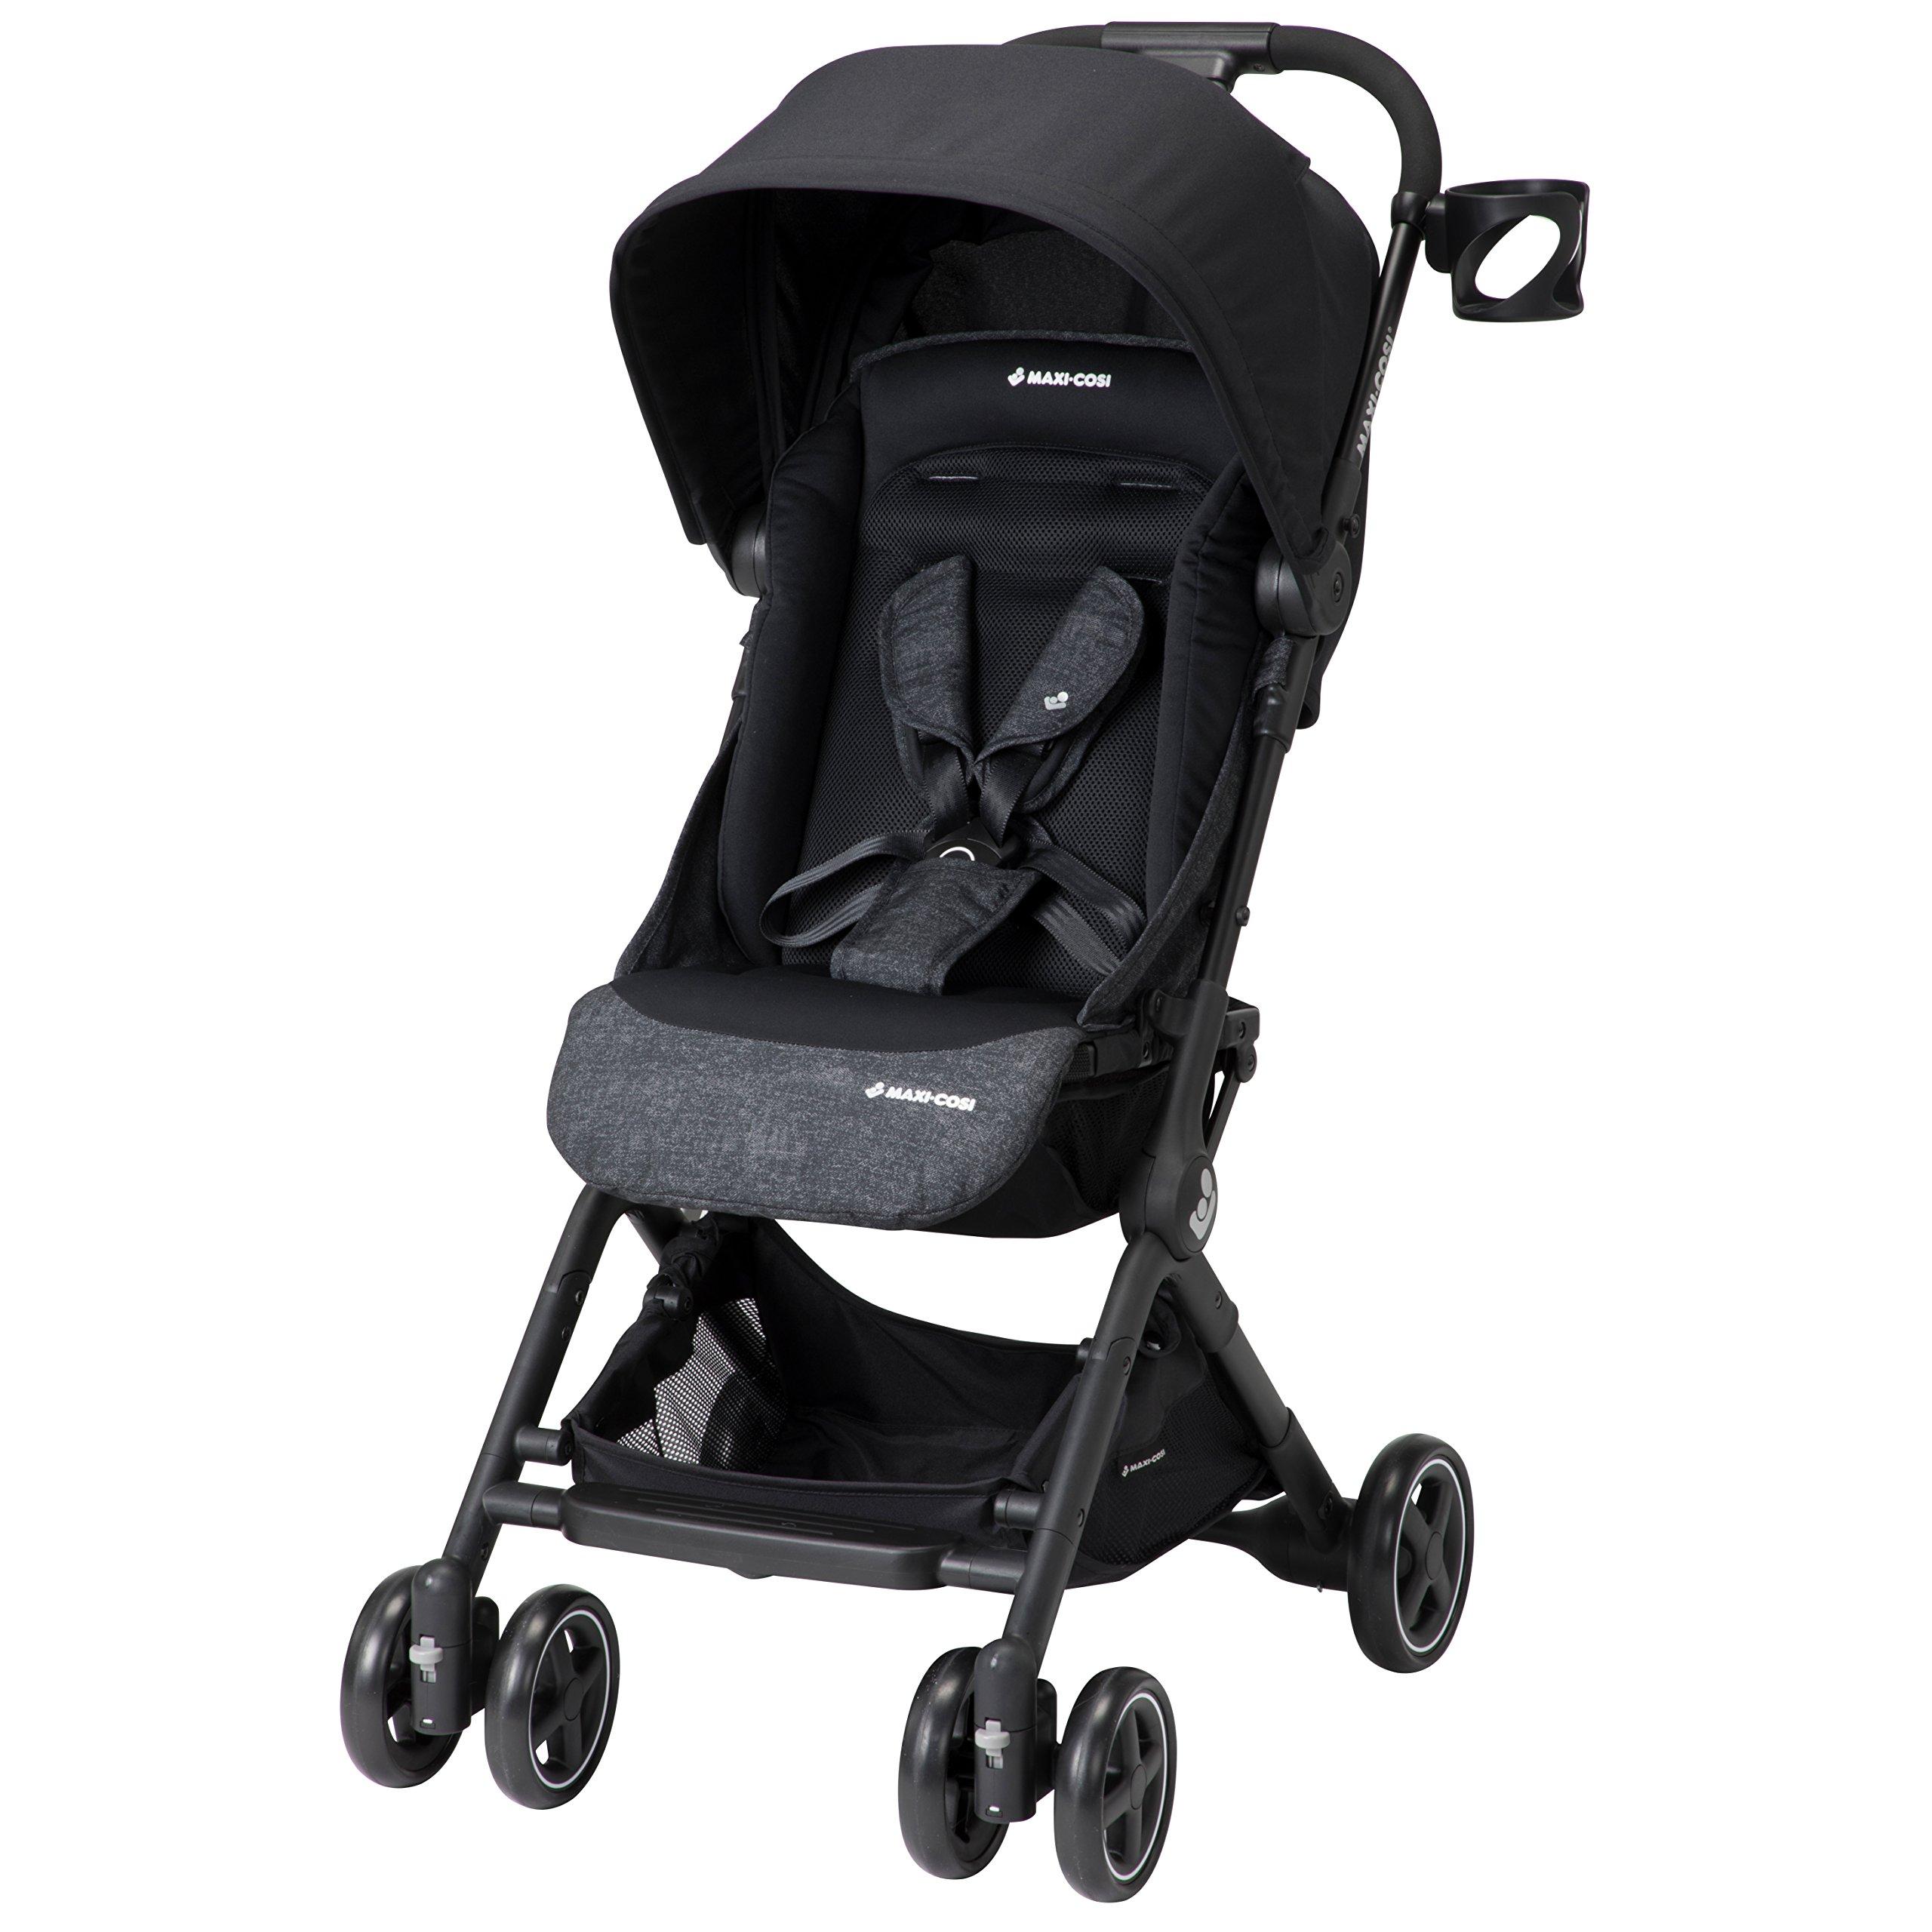 Maxi-Cosi Lara Lightweight Ultra Compact Stroller, Nomad Black, One Size